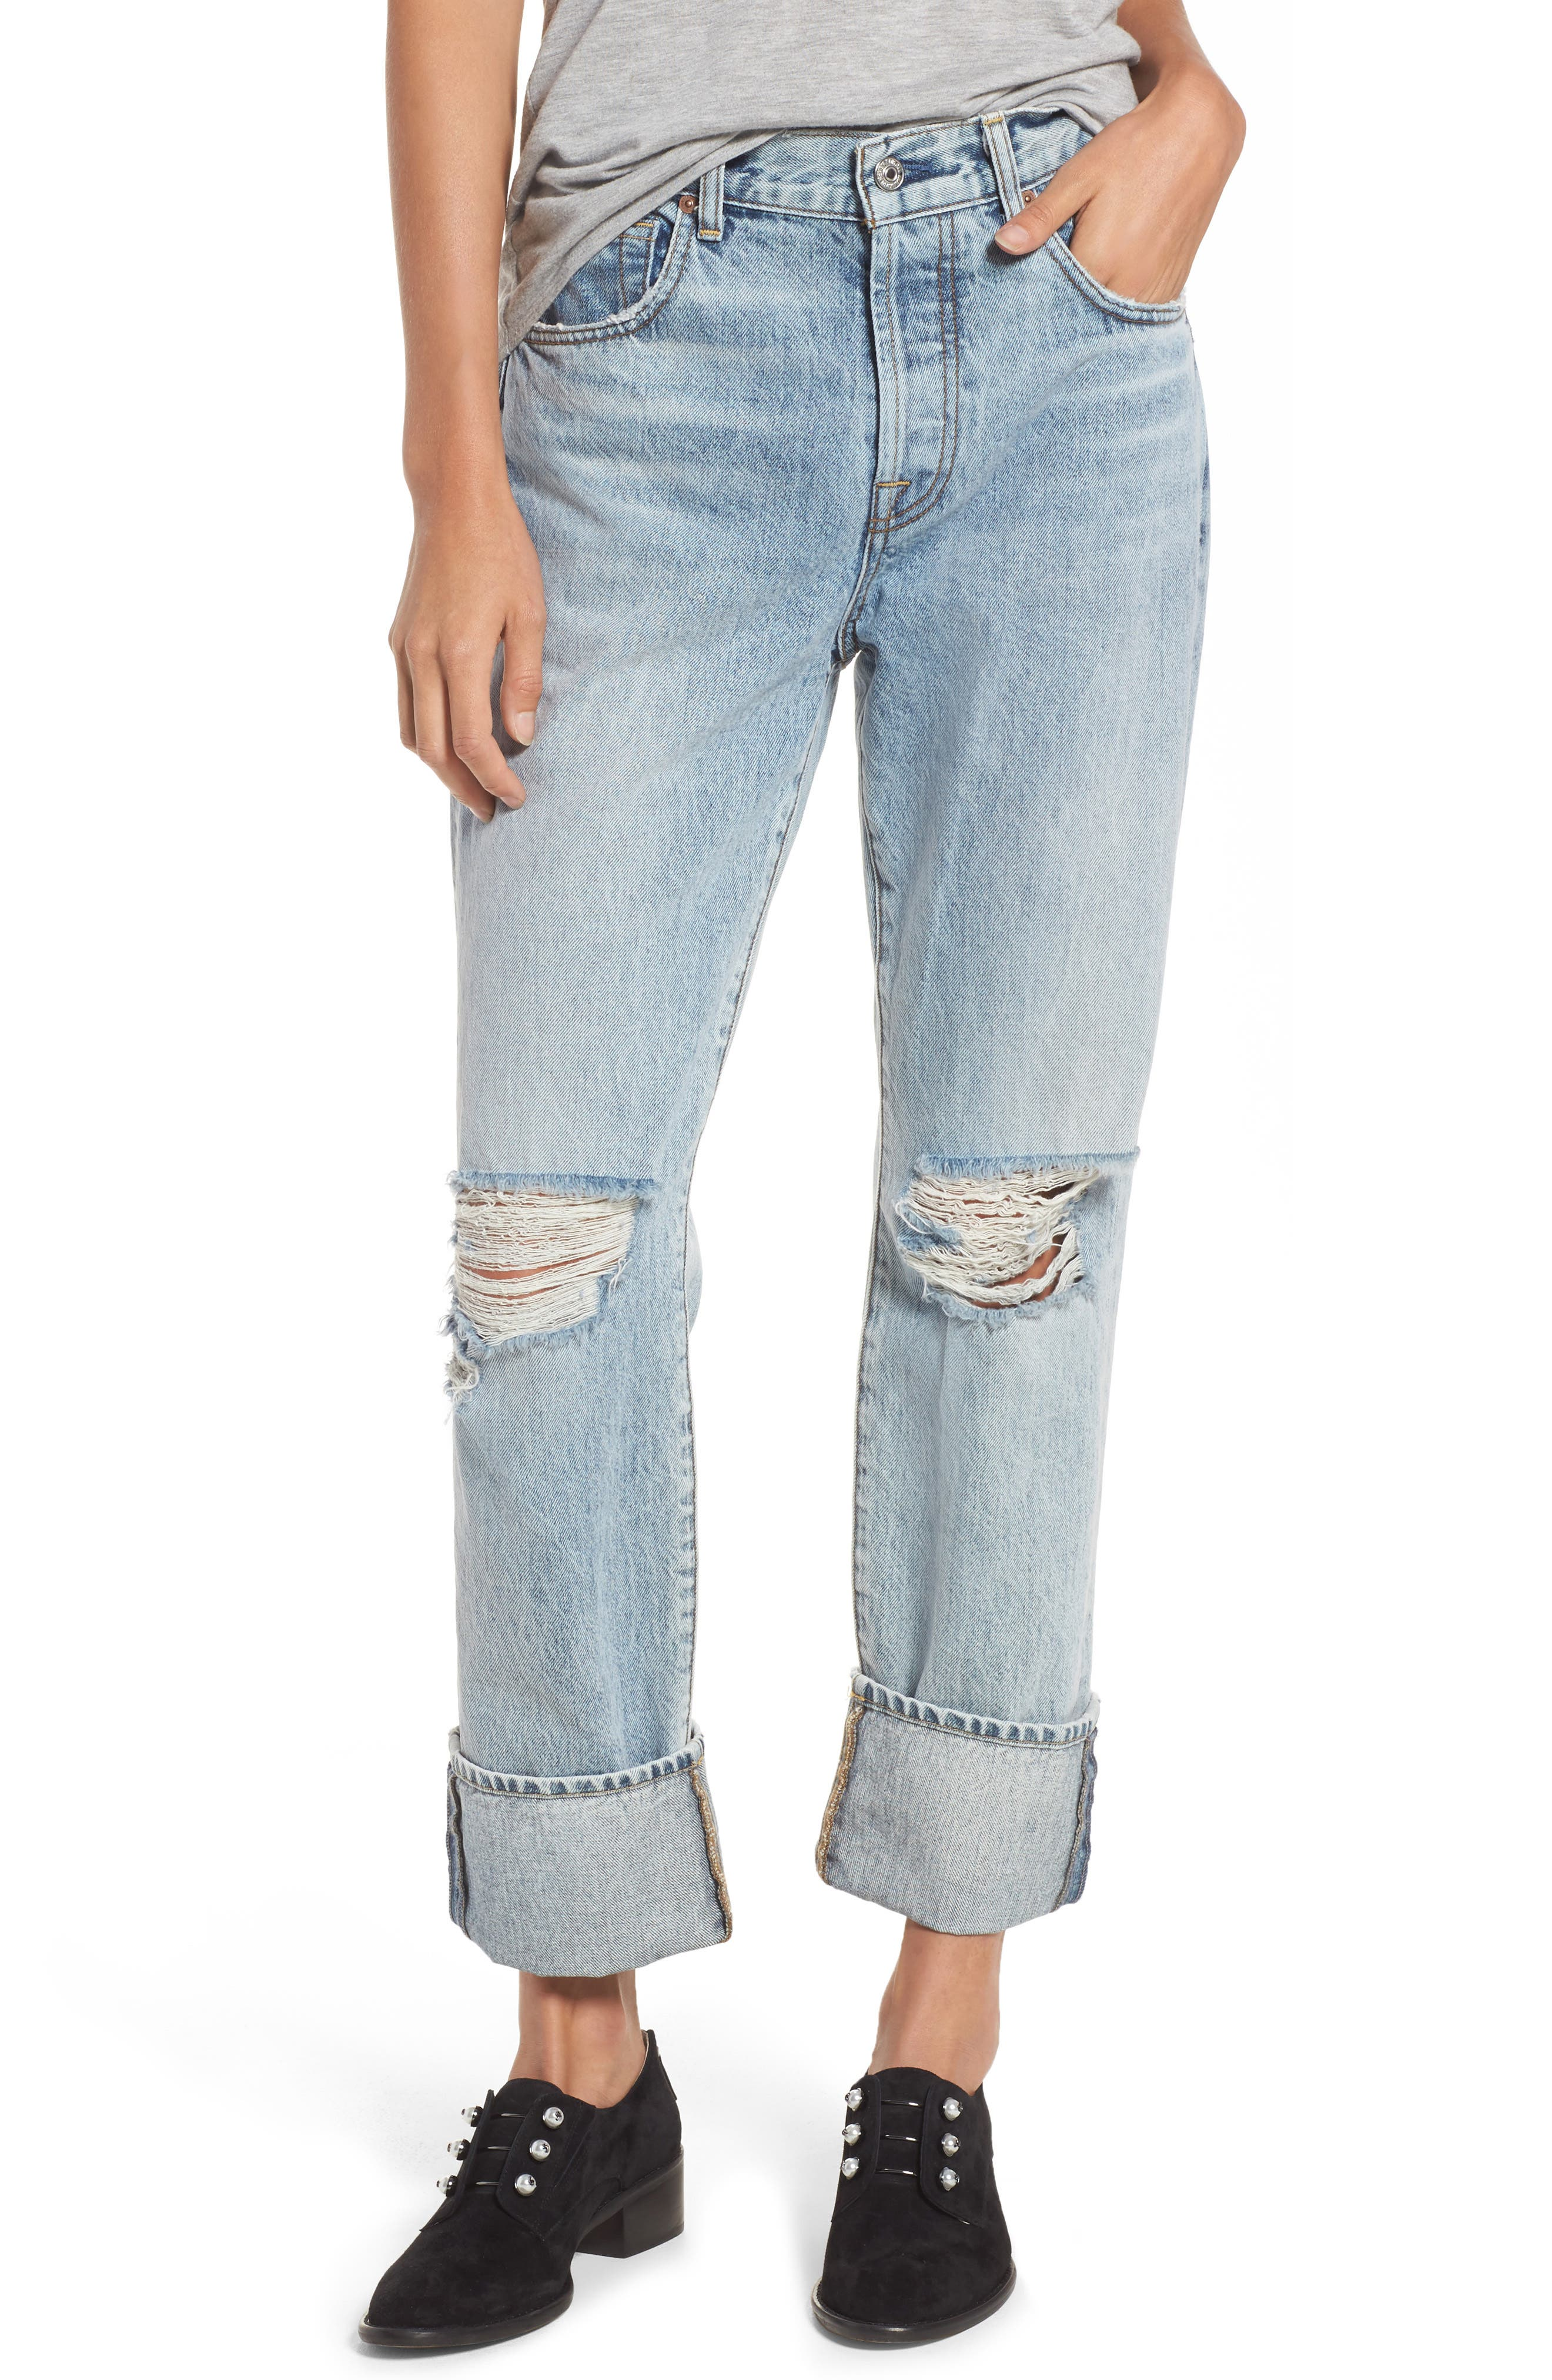 Rickie High Waist Boyfriend Jeans,                             Main thumbnail 1, color,                             Mineral Desert Springs 3